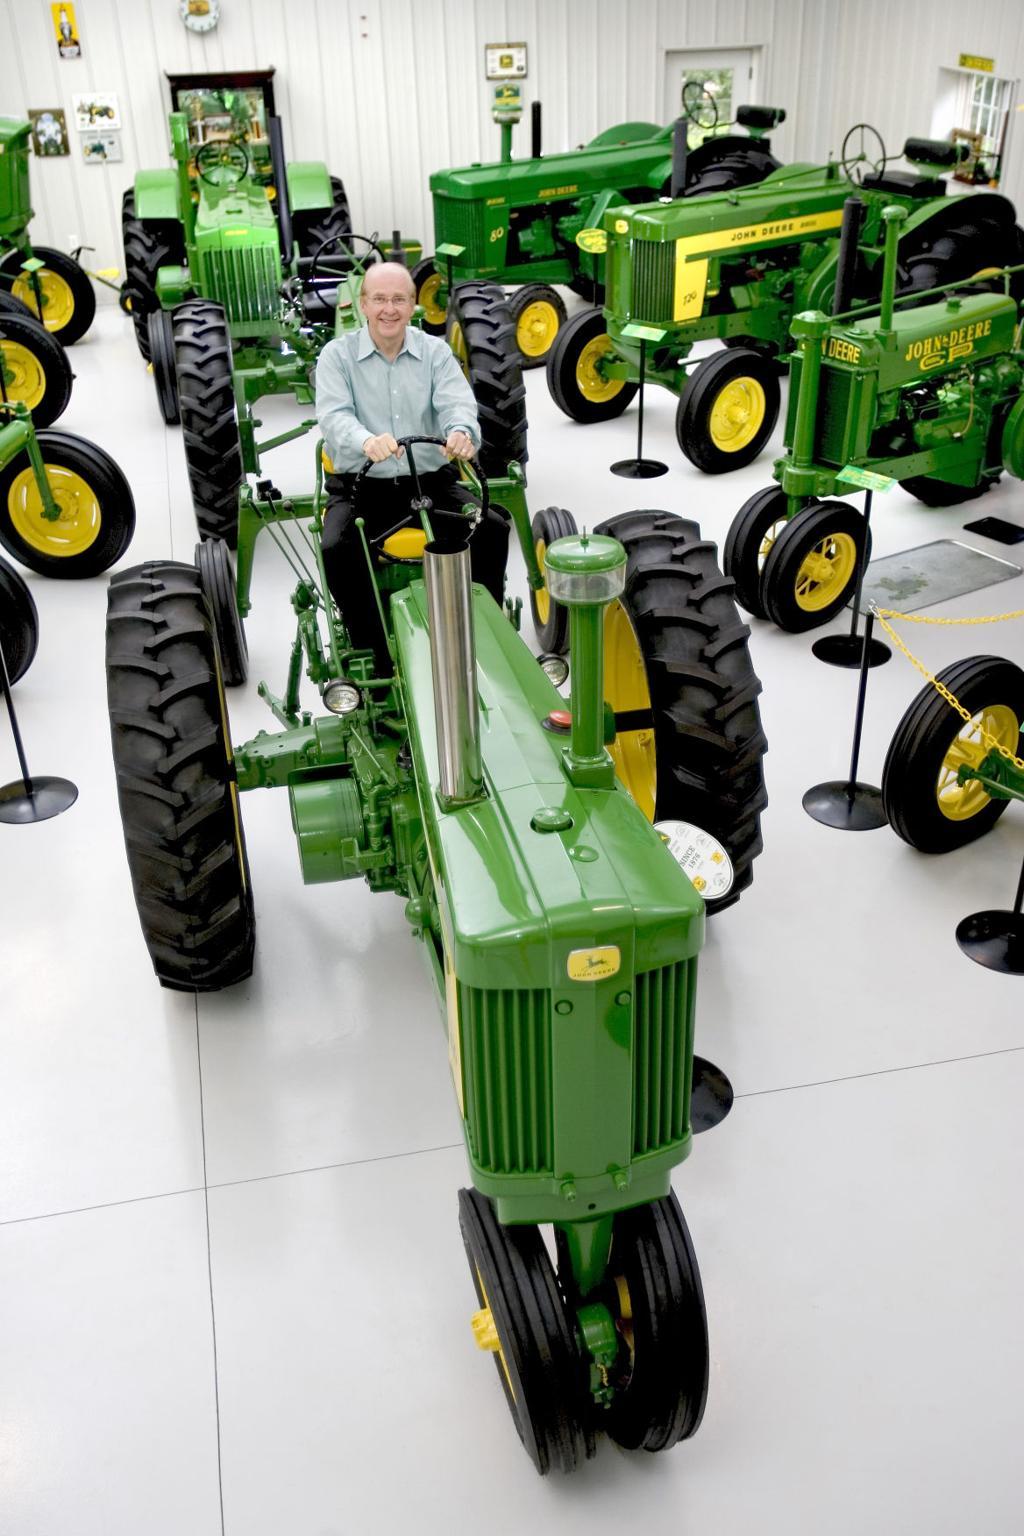 Tractor pull: John Deere hobby fills museum | News